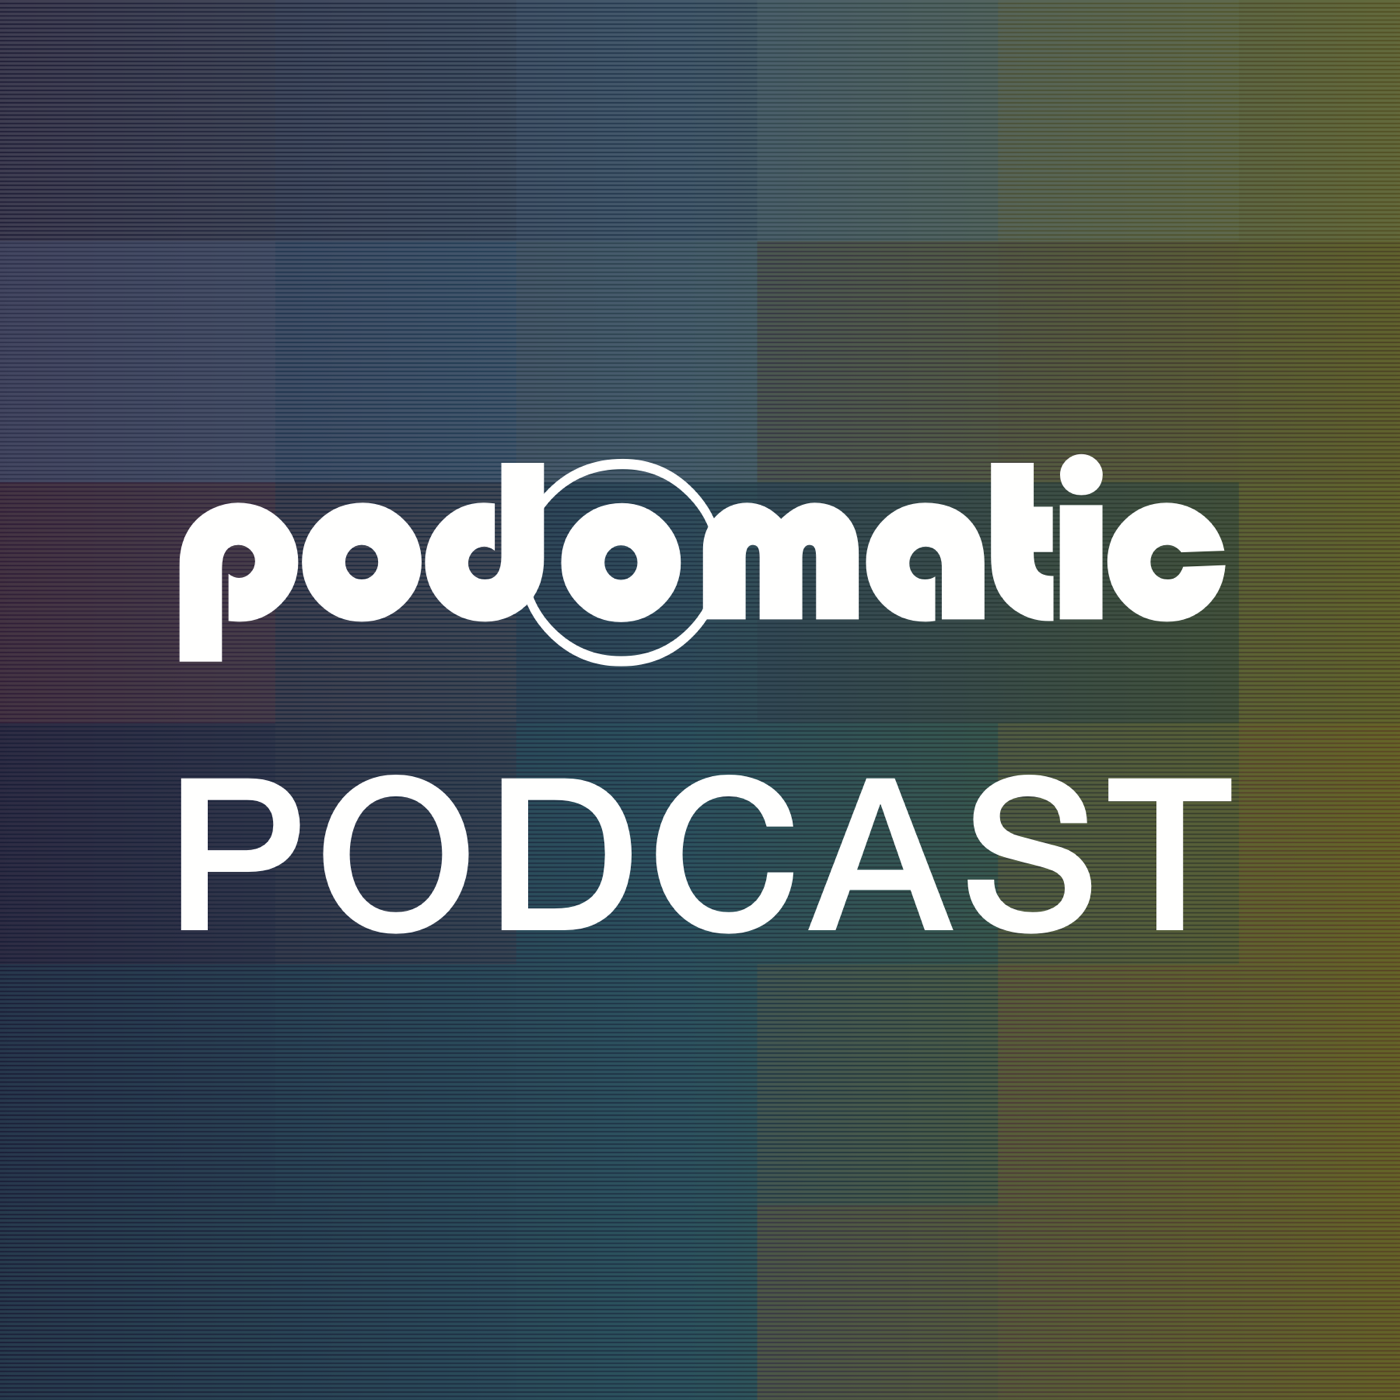 ETE567CSU's Podcast